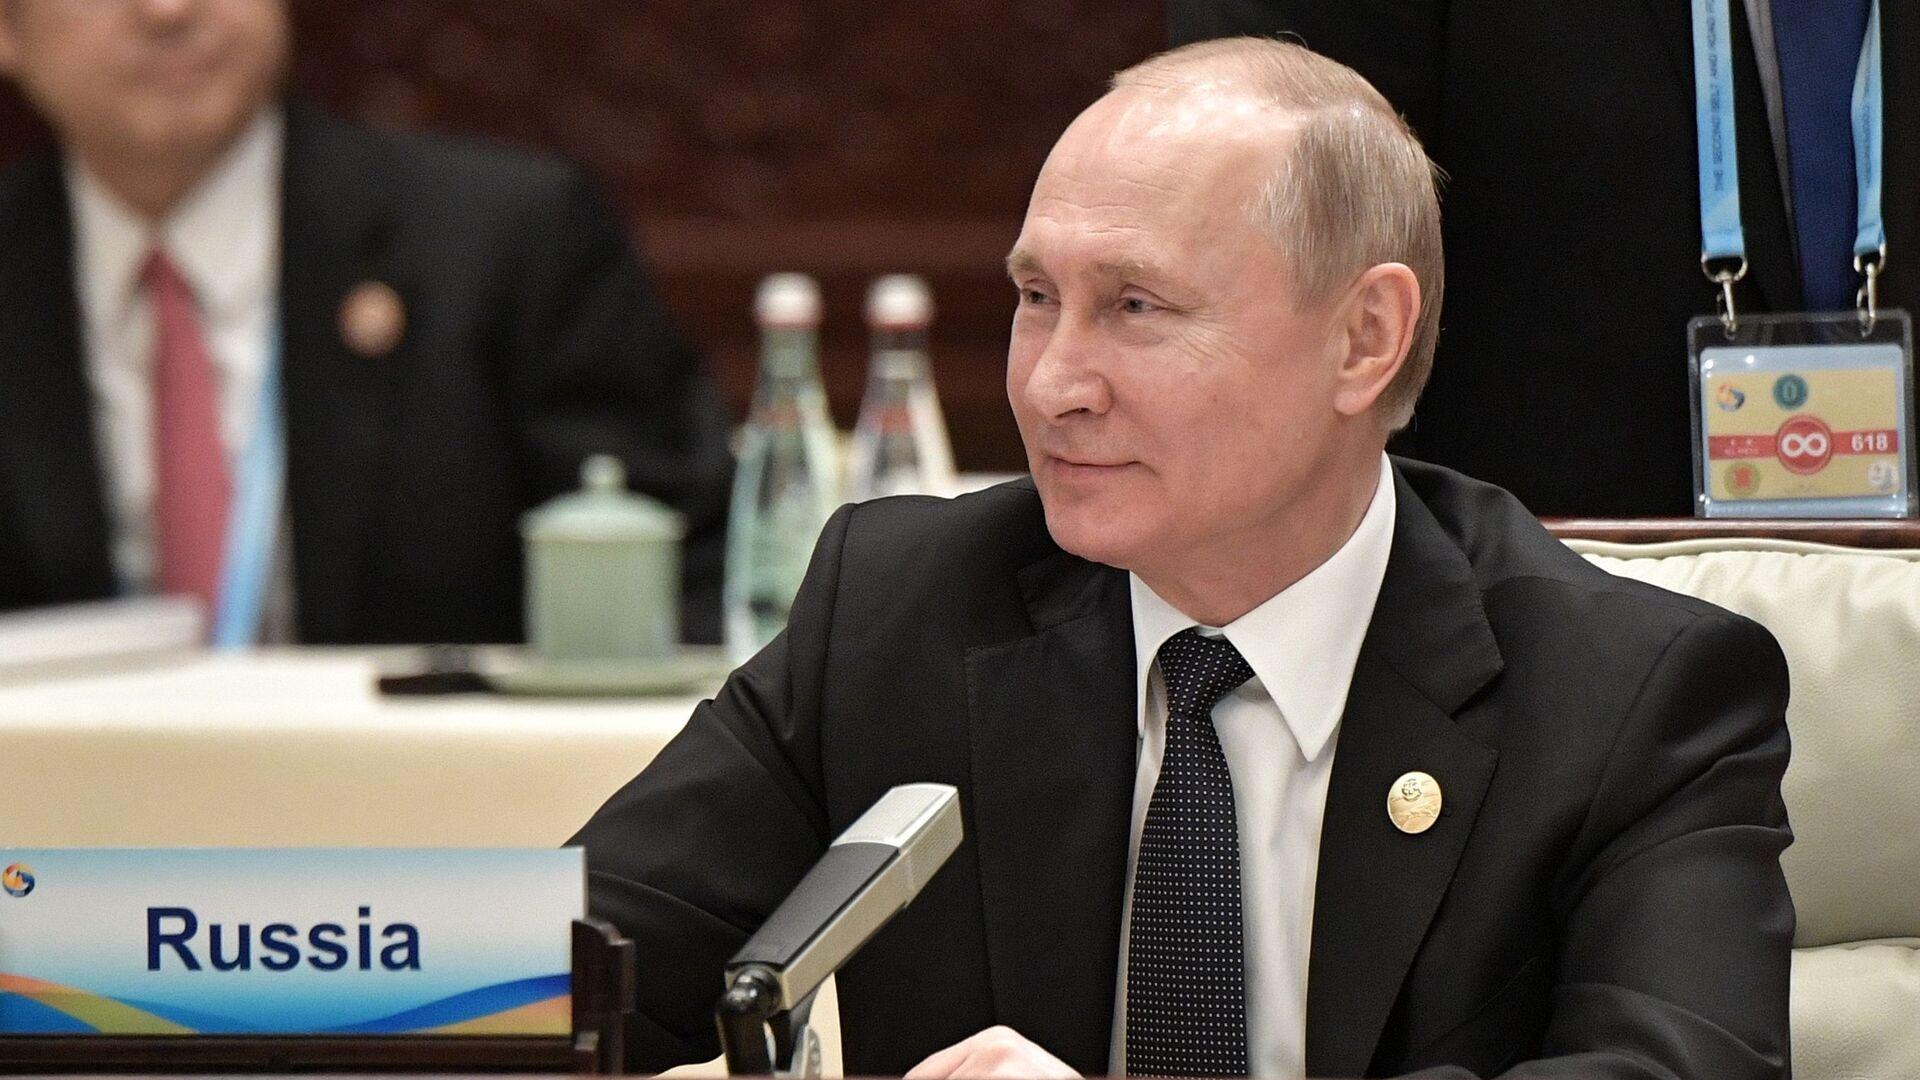 Президент России Владимир Путин - Sputnik Таджикистан, 1920, 22.09.2021